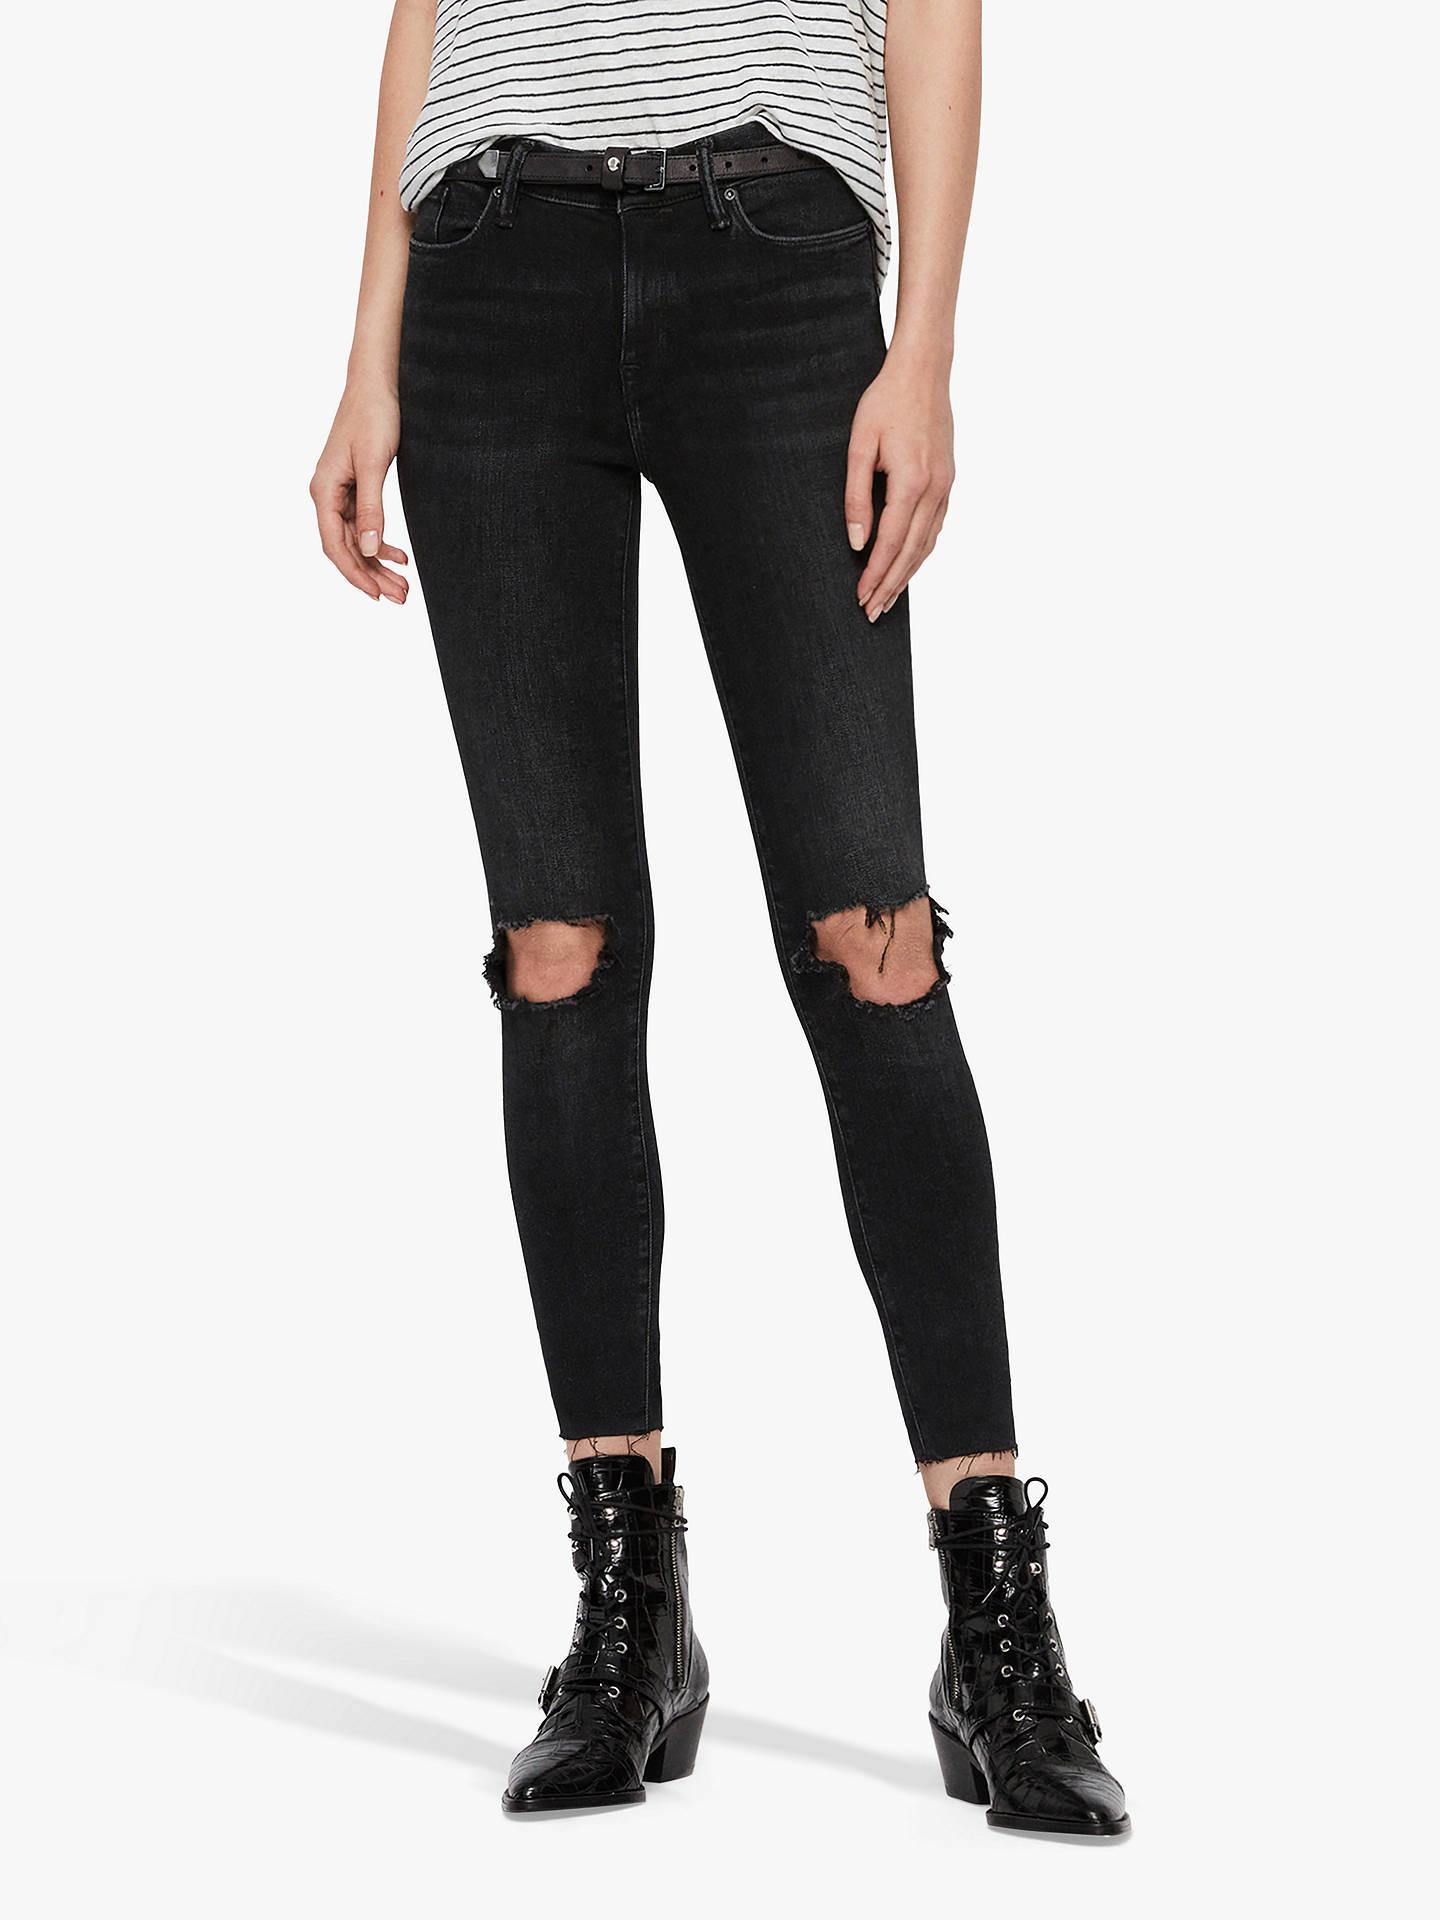 AllSaints Grace Ankle Fray Jeans, Washed Black